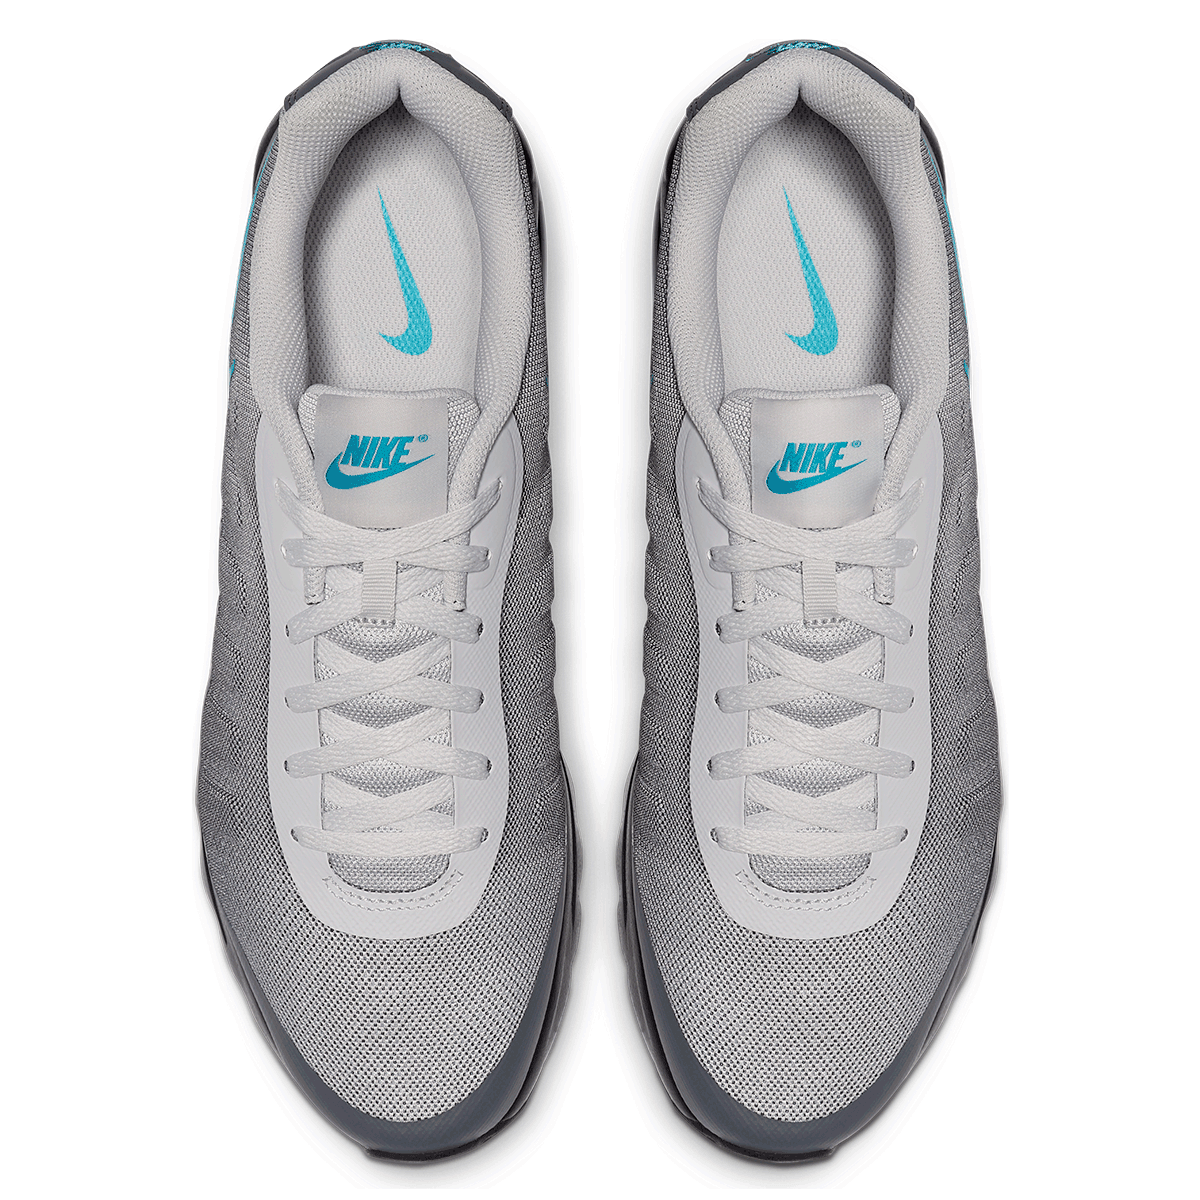 Nike Laufschuh Air Max Invigor dunkelgrautürkis